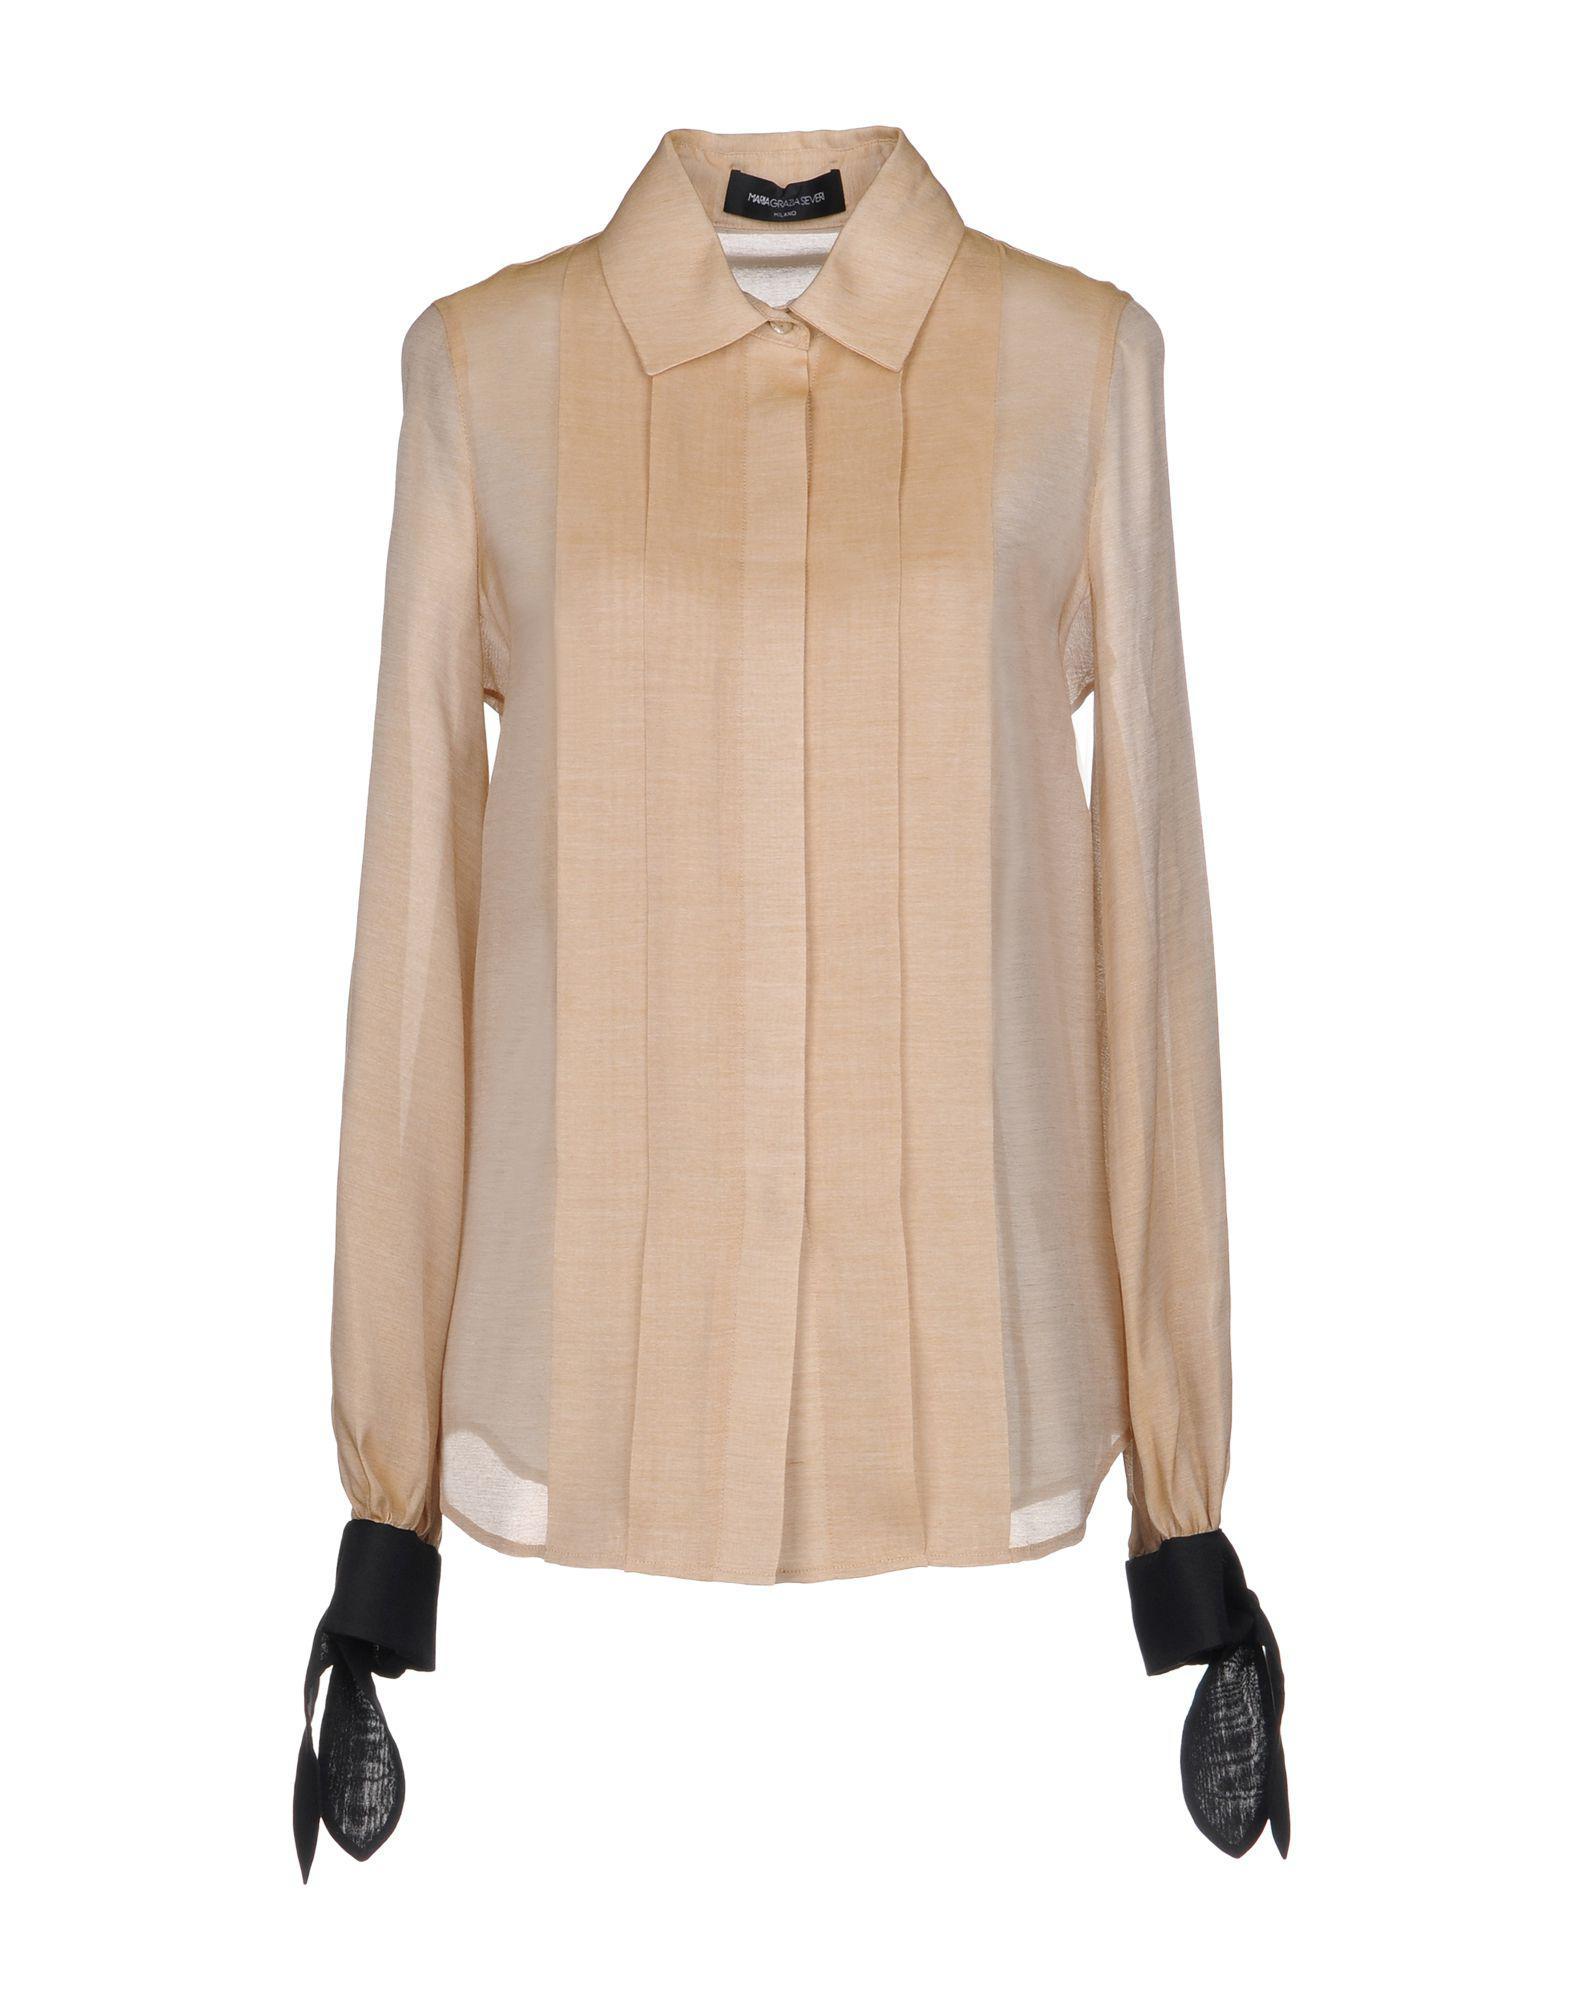 SHIRTS - Shirts Maria Grazia Severi Cheap Manchester vYry4